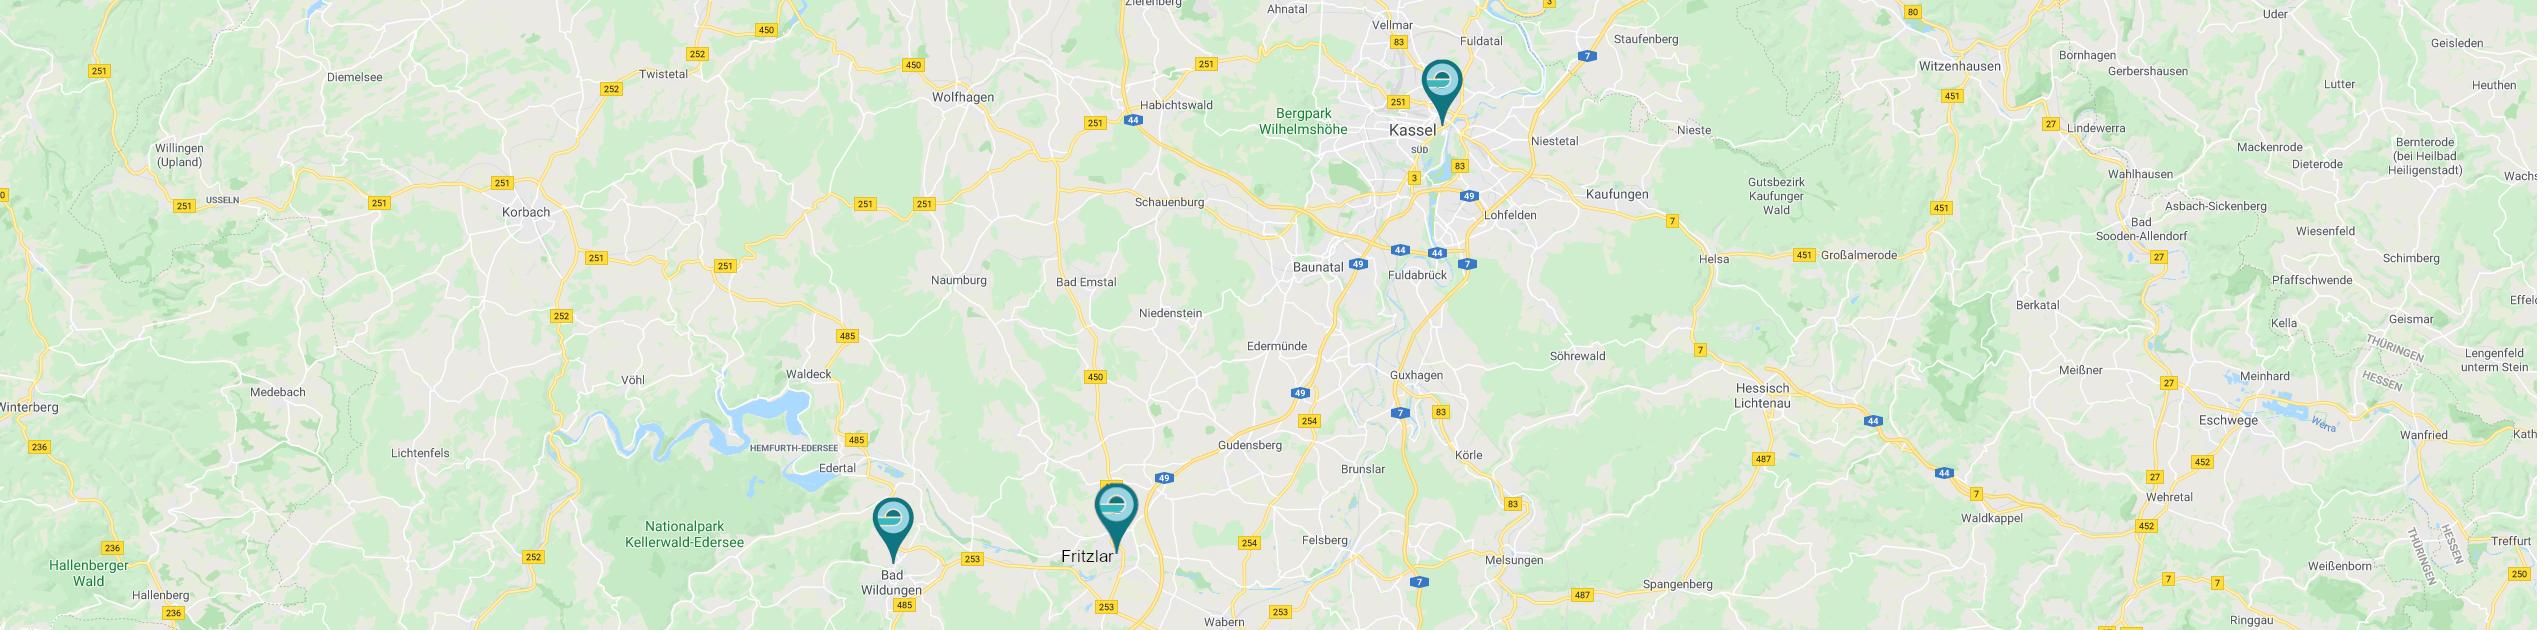 Standorte Prostata MRT